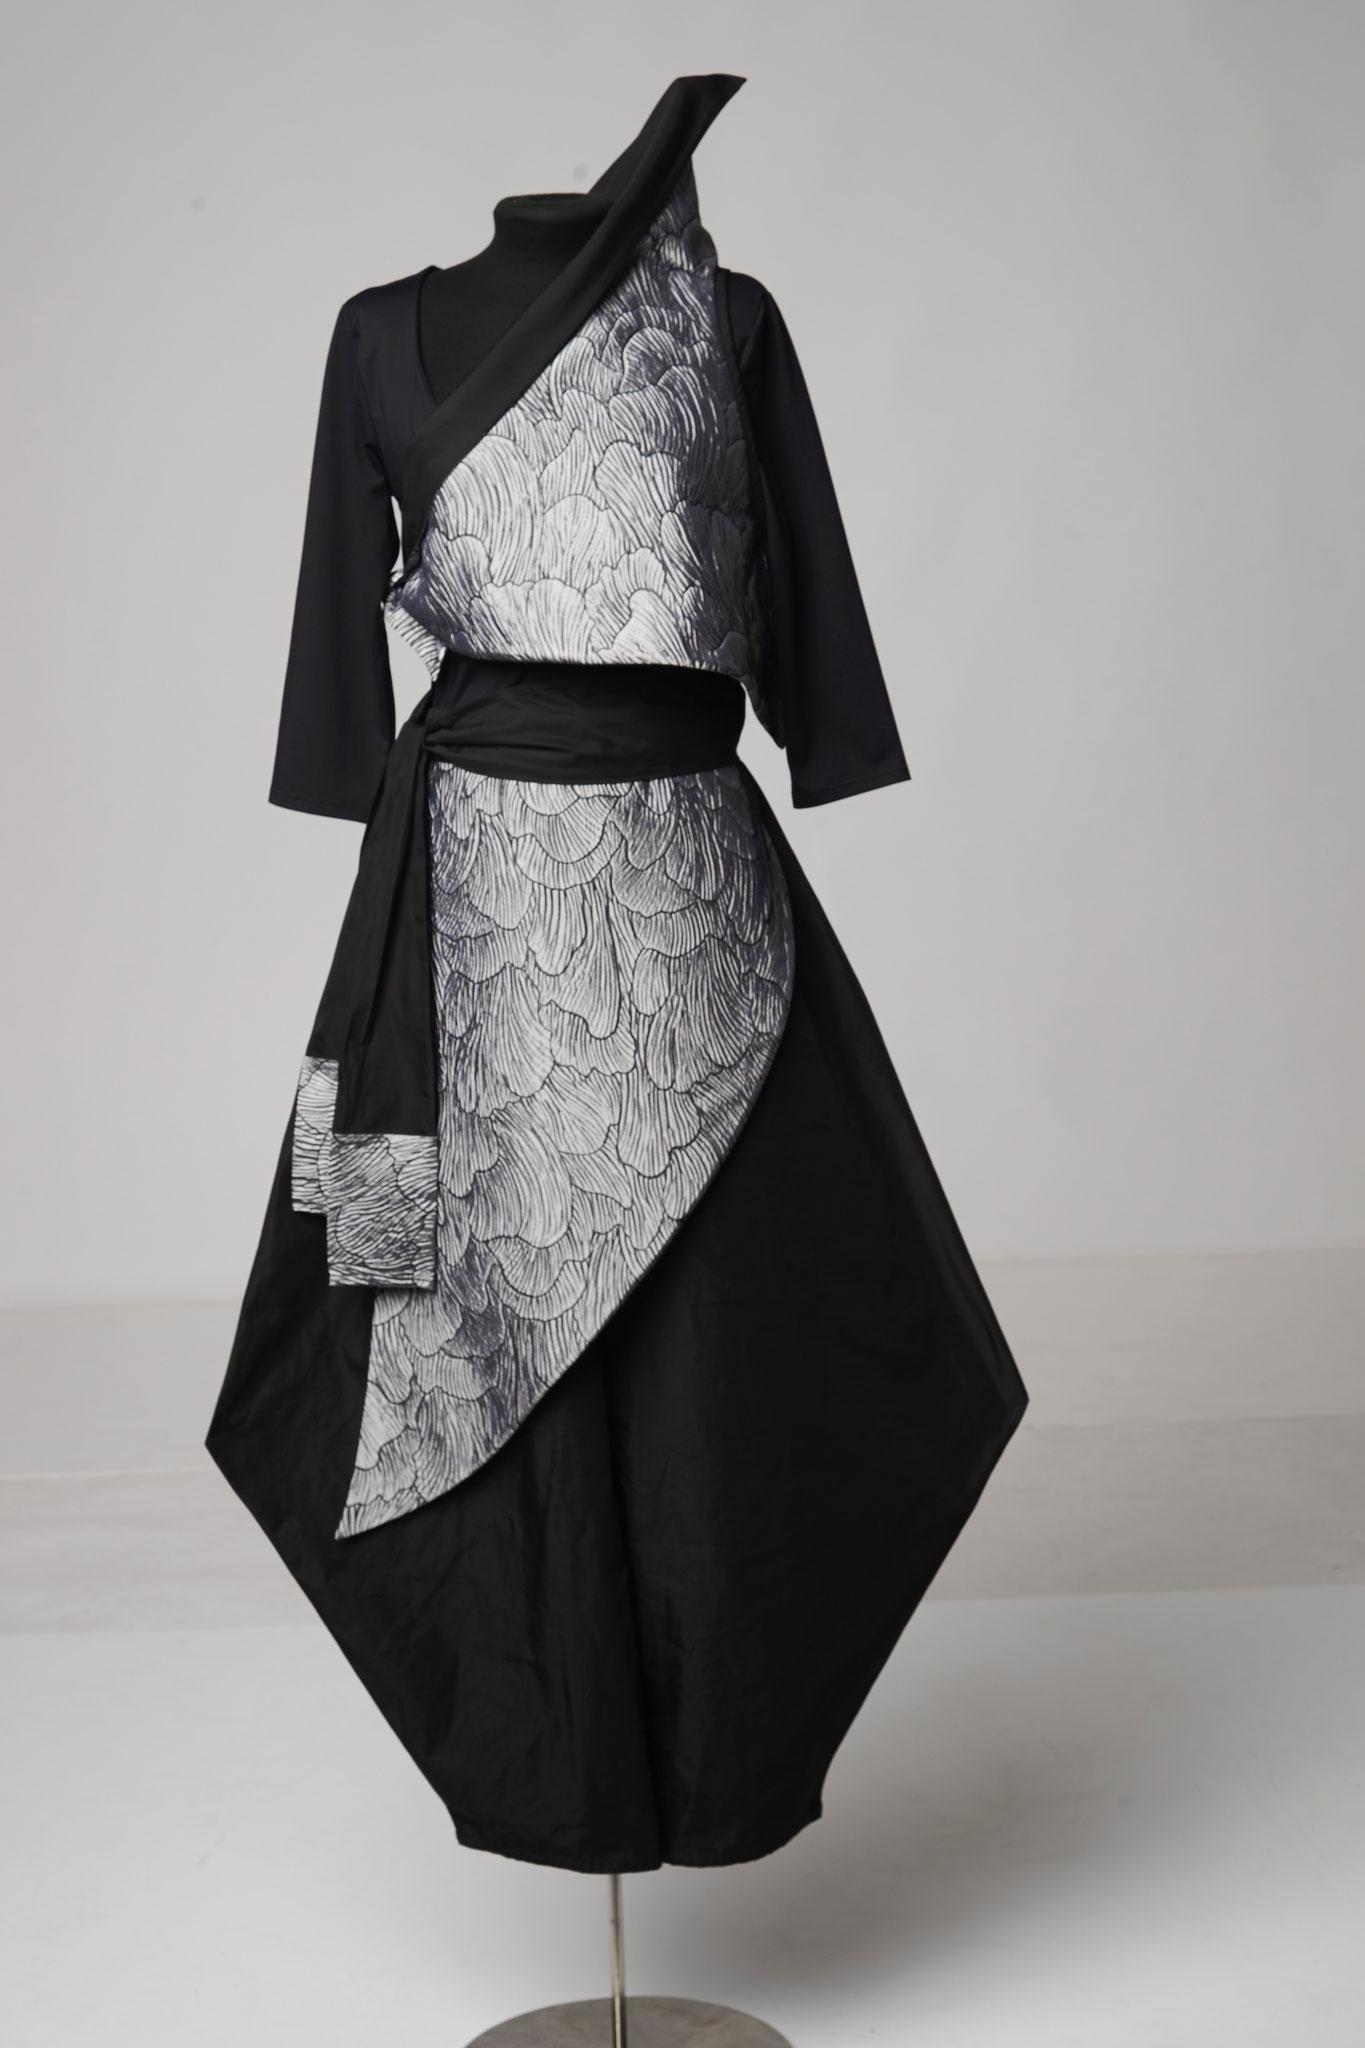 4-teiliges Outfit: Zipfelhose,Schurz, Schärpe, Dreieck Oberteil. Material: Seide/Viskose/PAN/ Mikrofaser